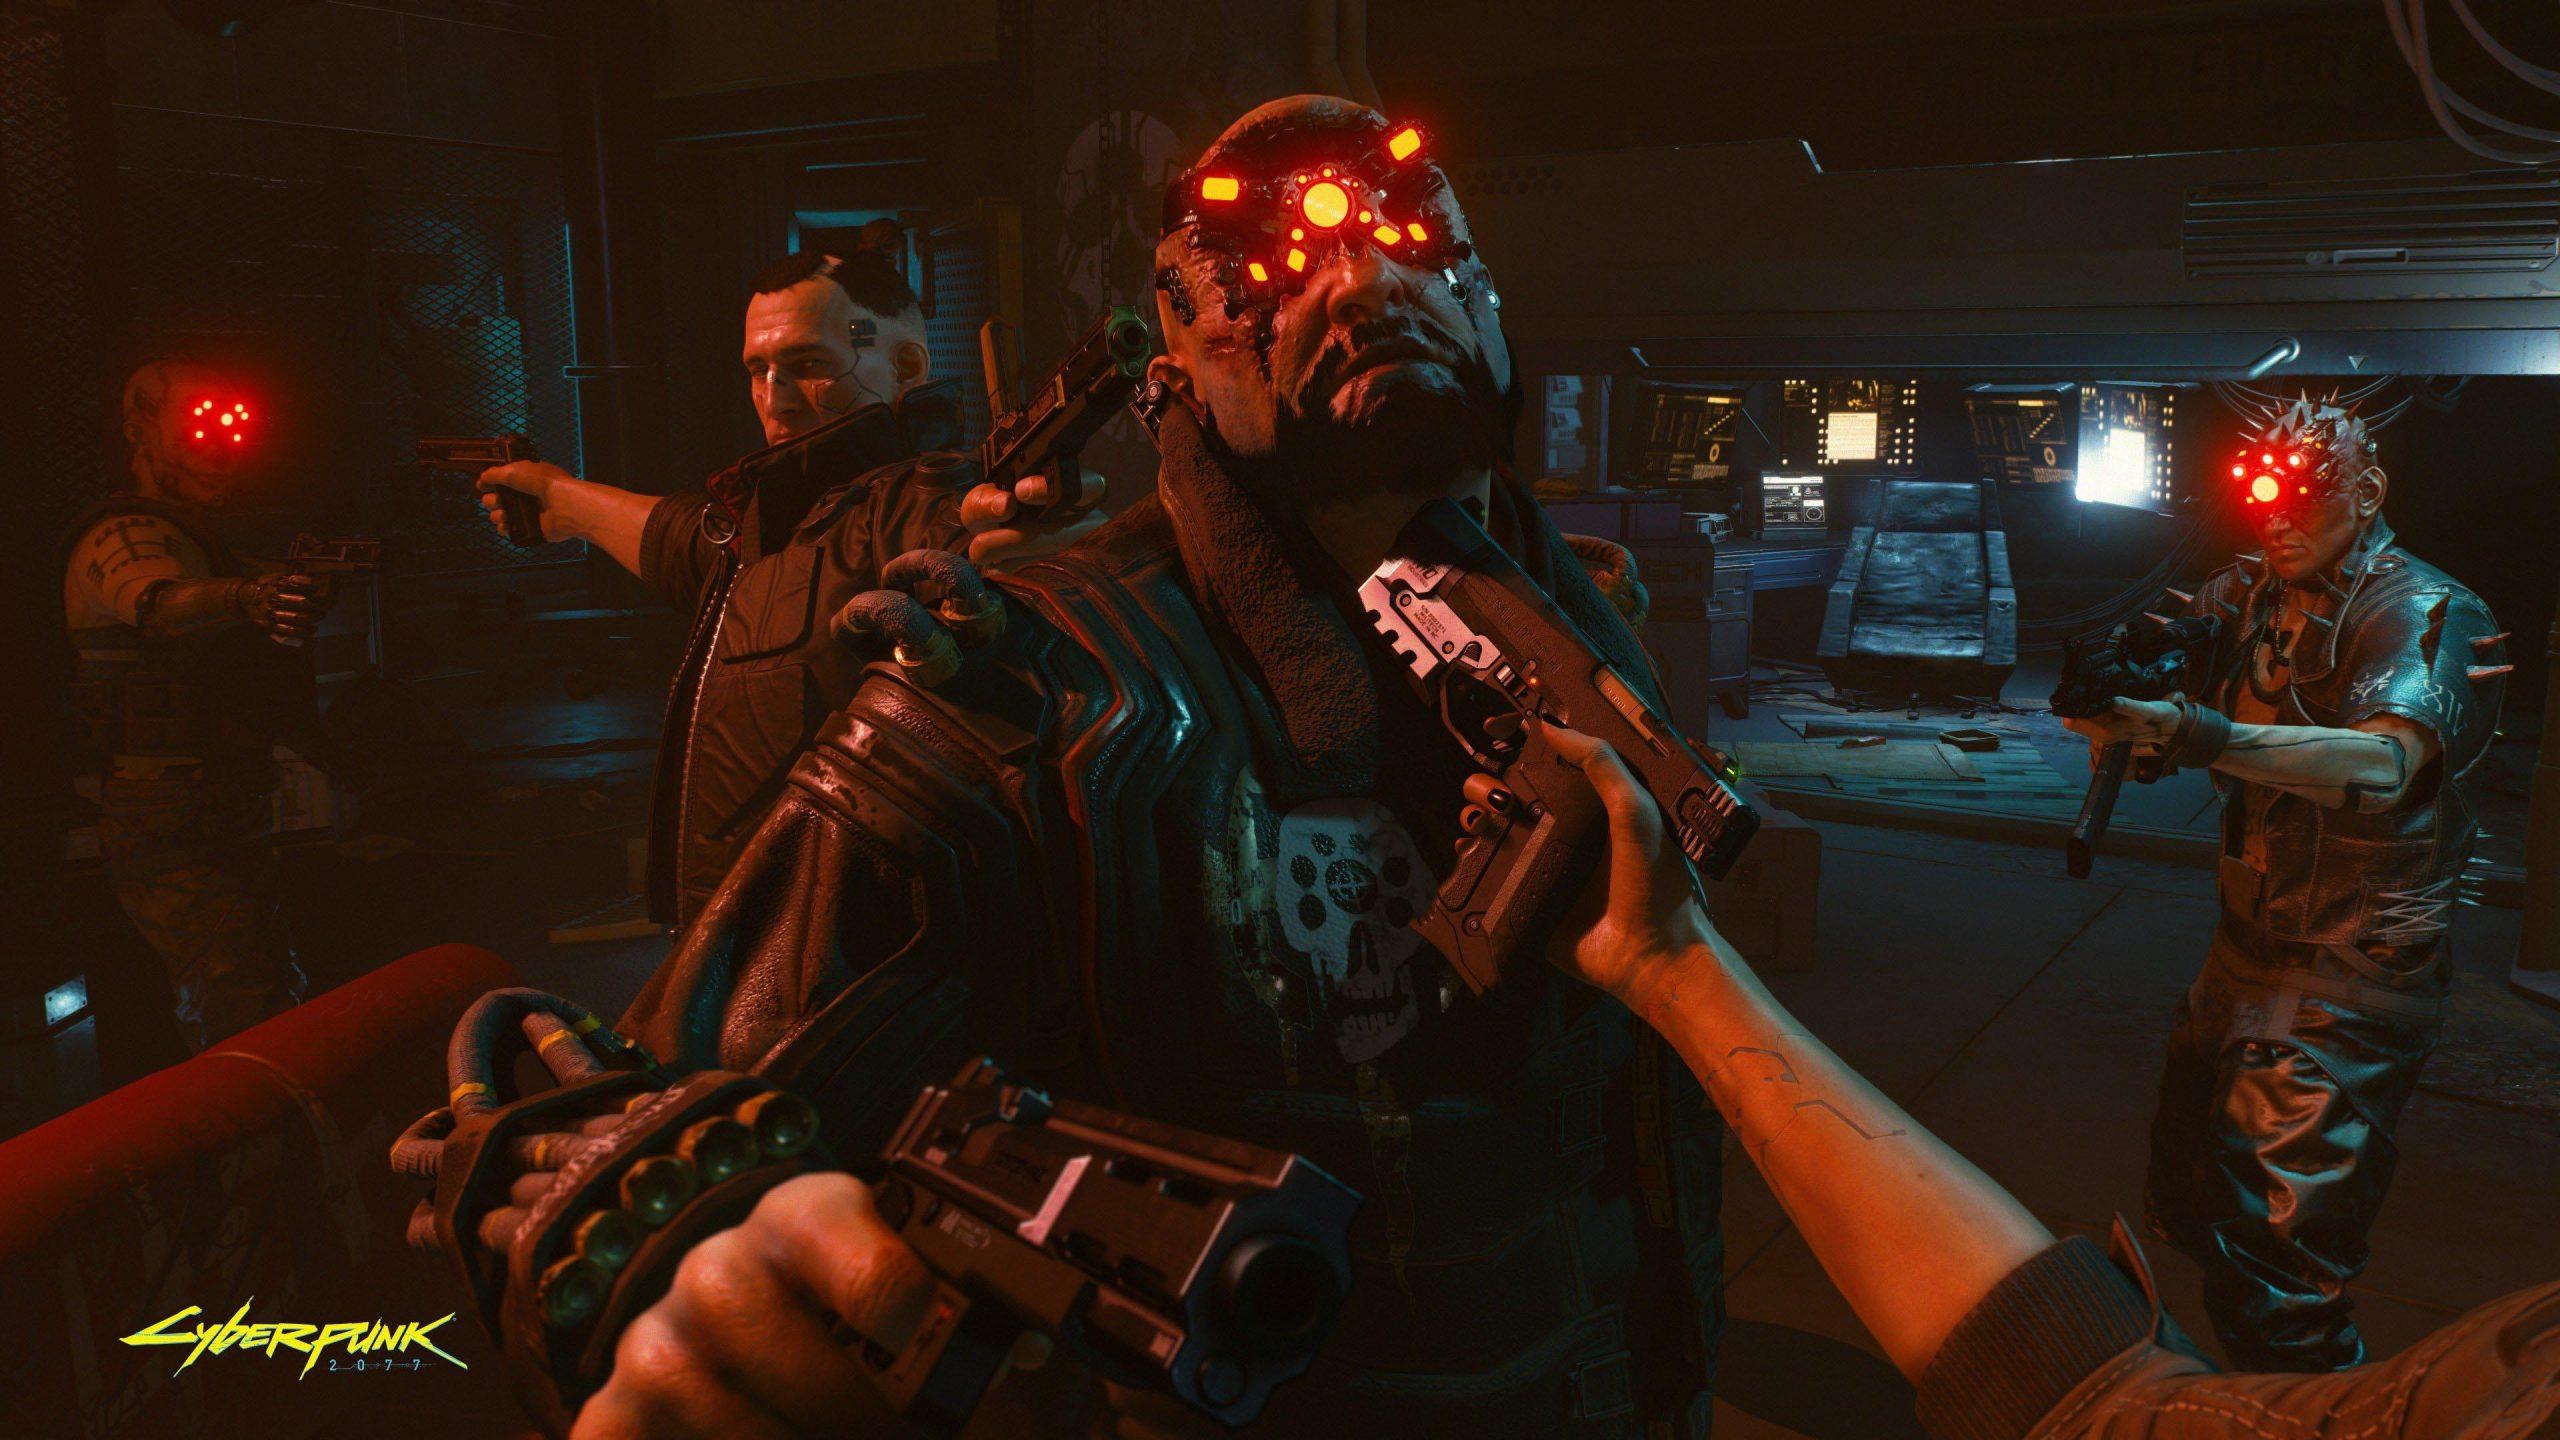 Cyberpunk 2020: игра, на которой основан Cyberpunk 2077 16